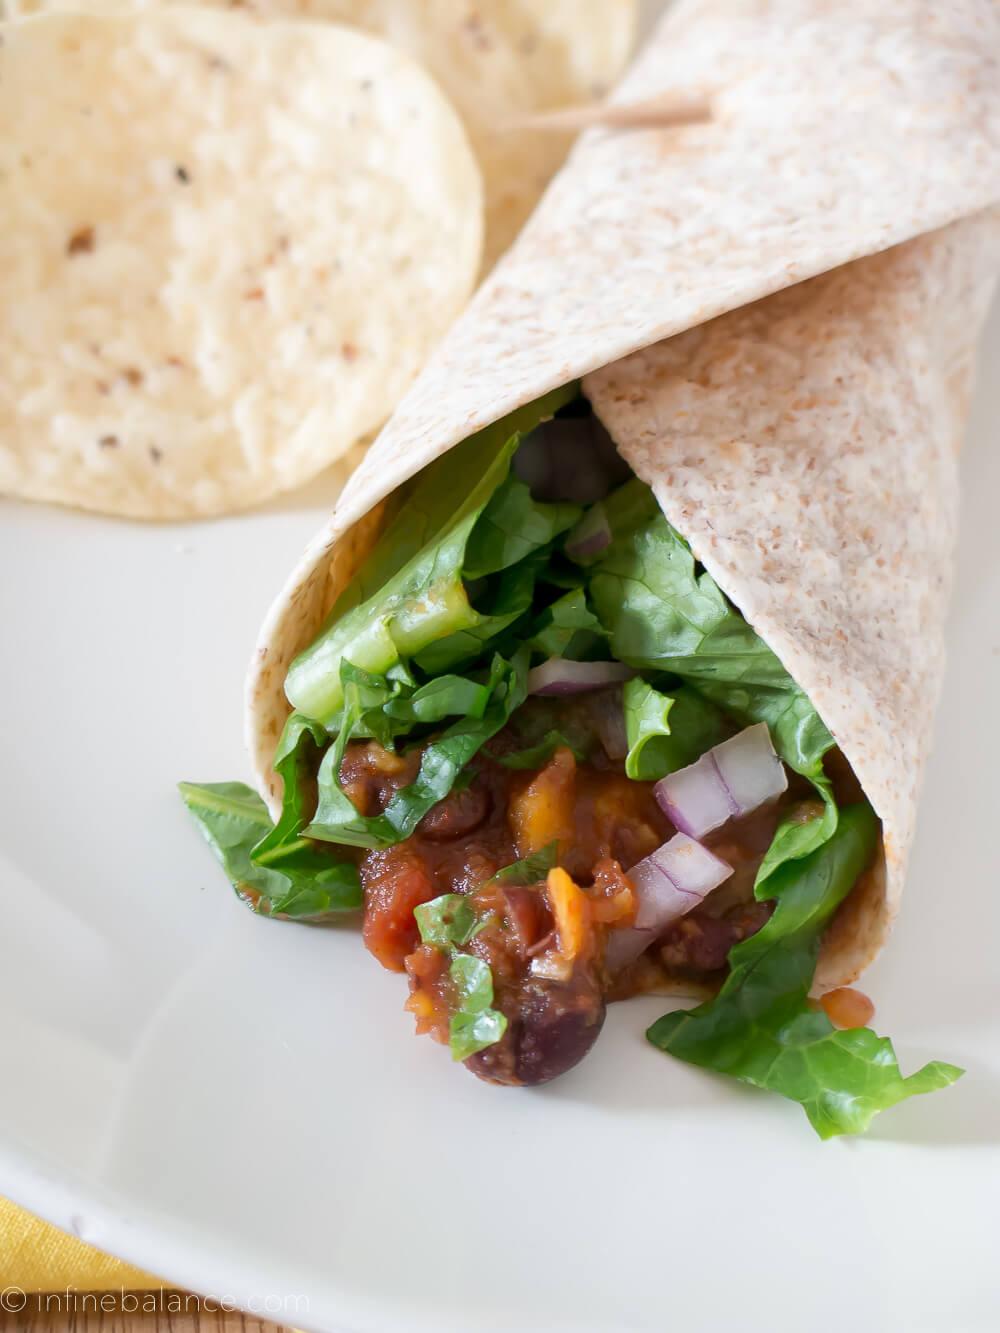 Sweet Potato and Black Bean Tacos | www.infinebalance.com #vegetarian #crockpot #slowcooker